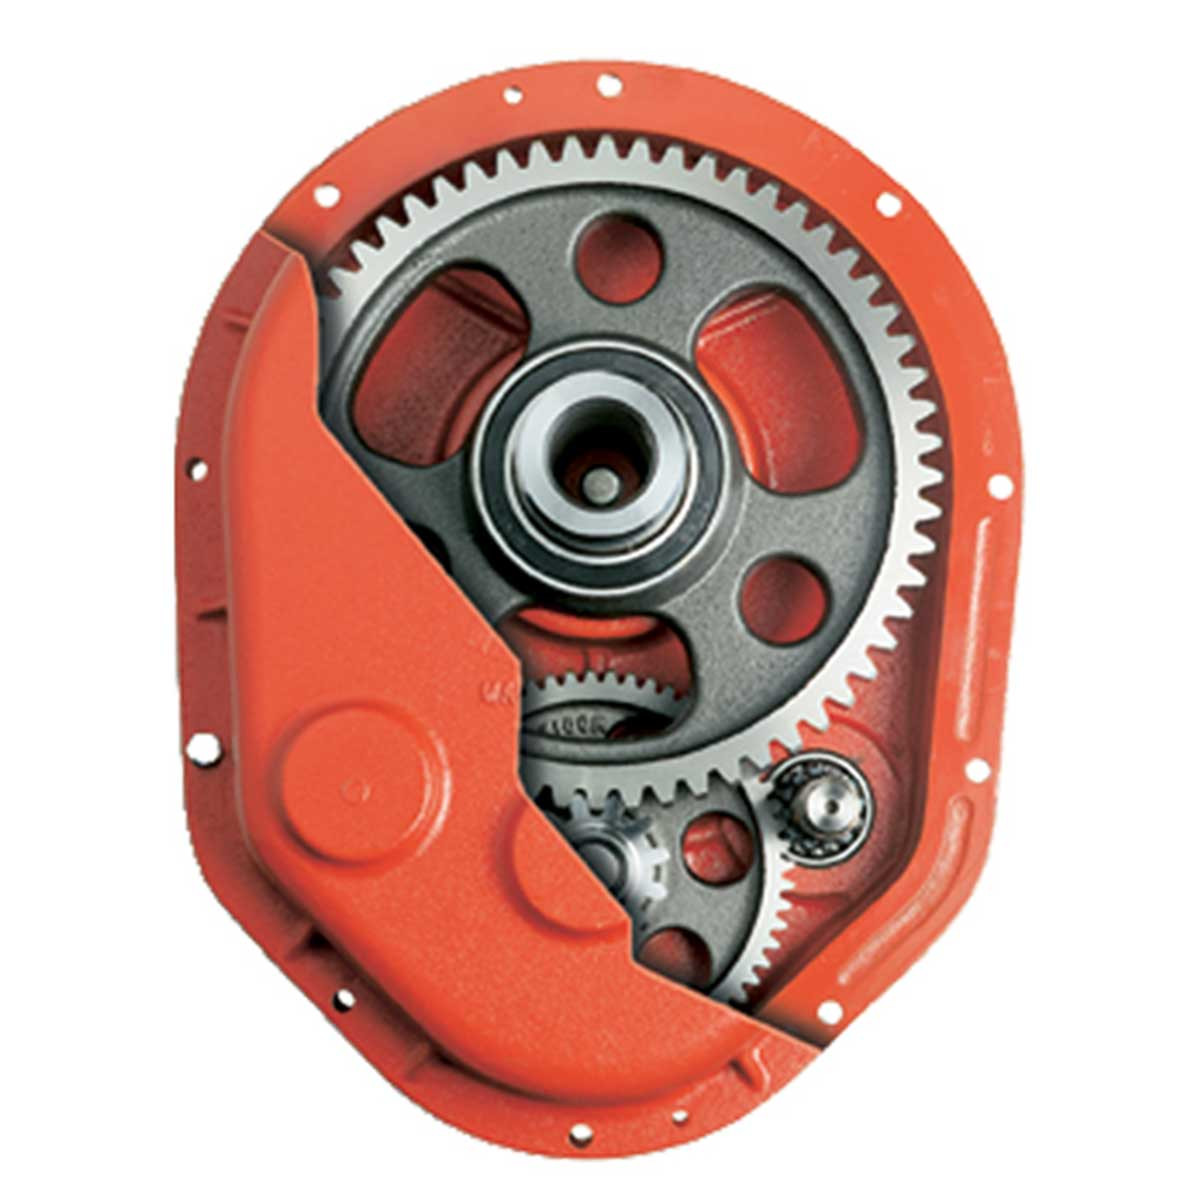 Crown Poly Drum Mixer gearbox